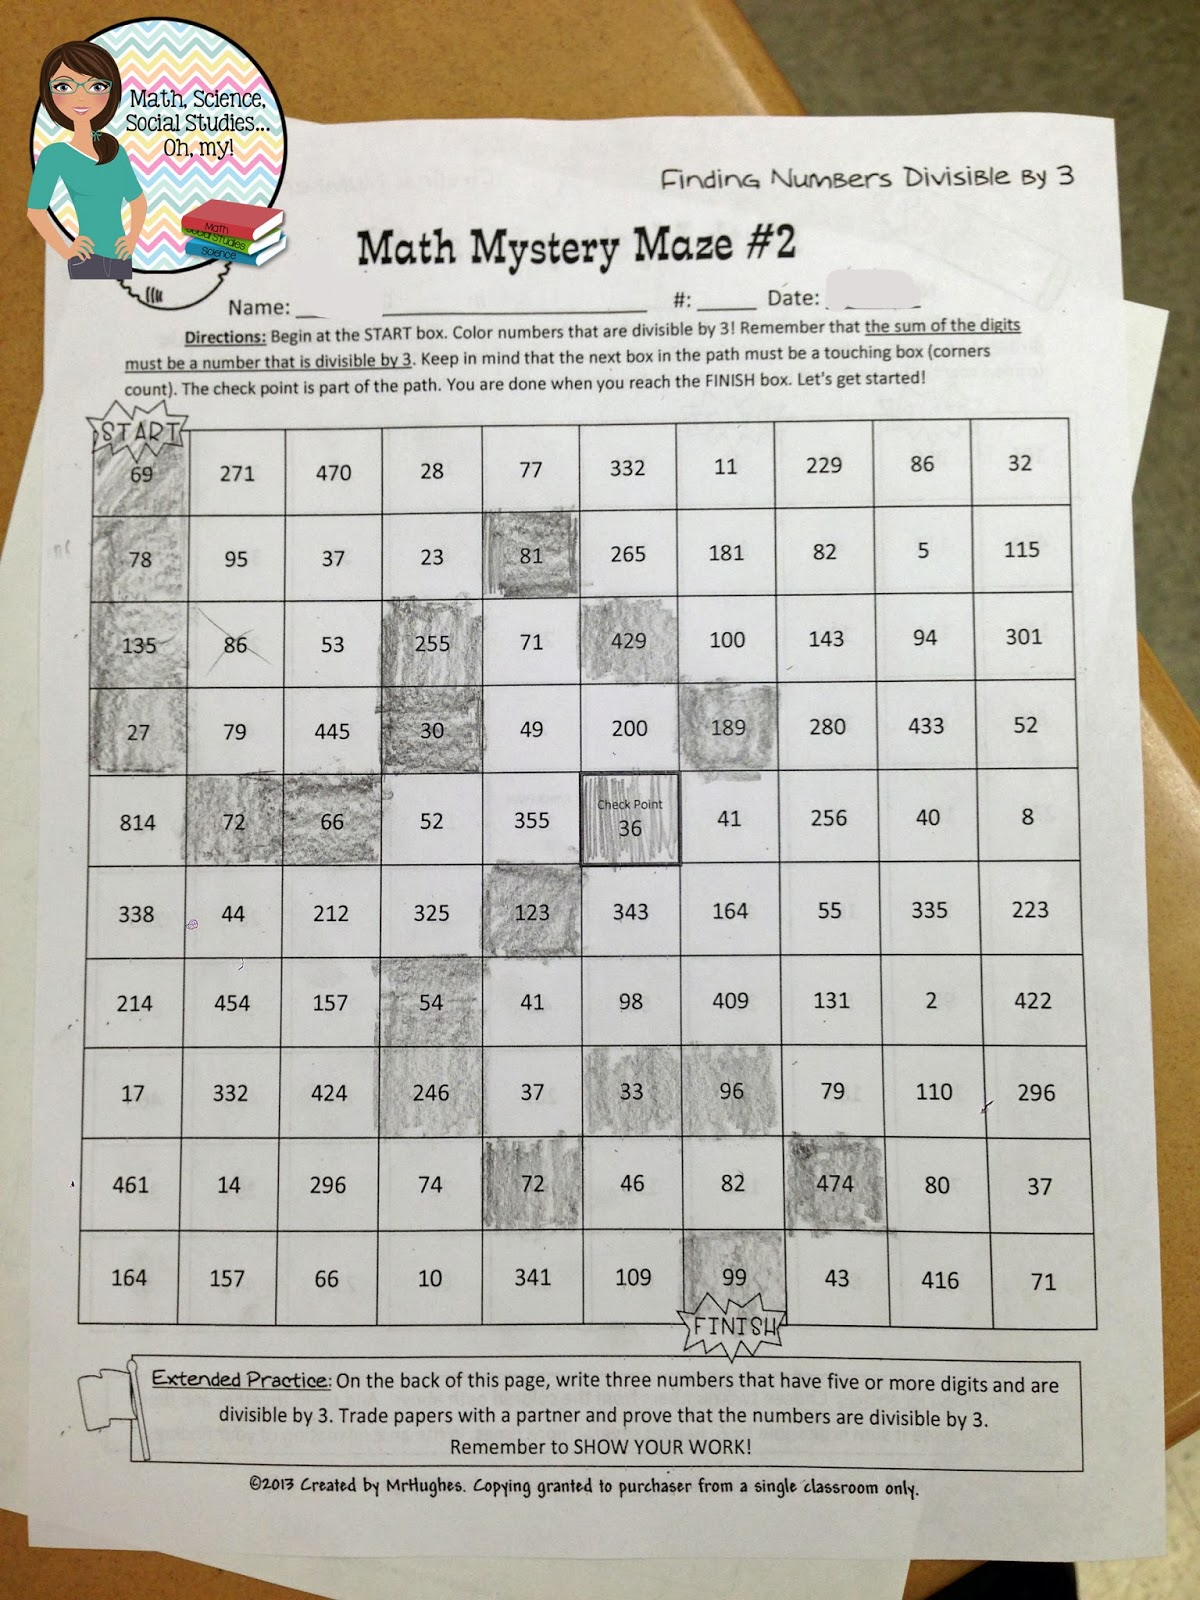 Math Science Social Stu S Oh My December